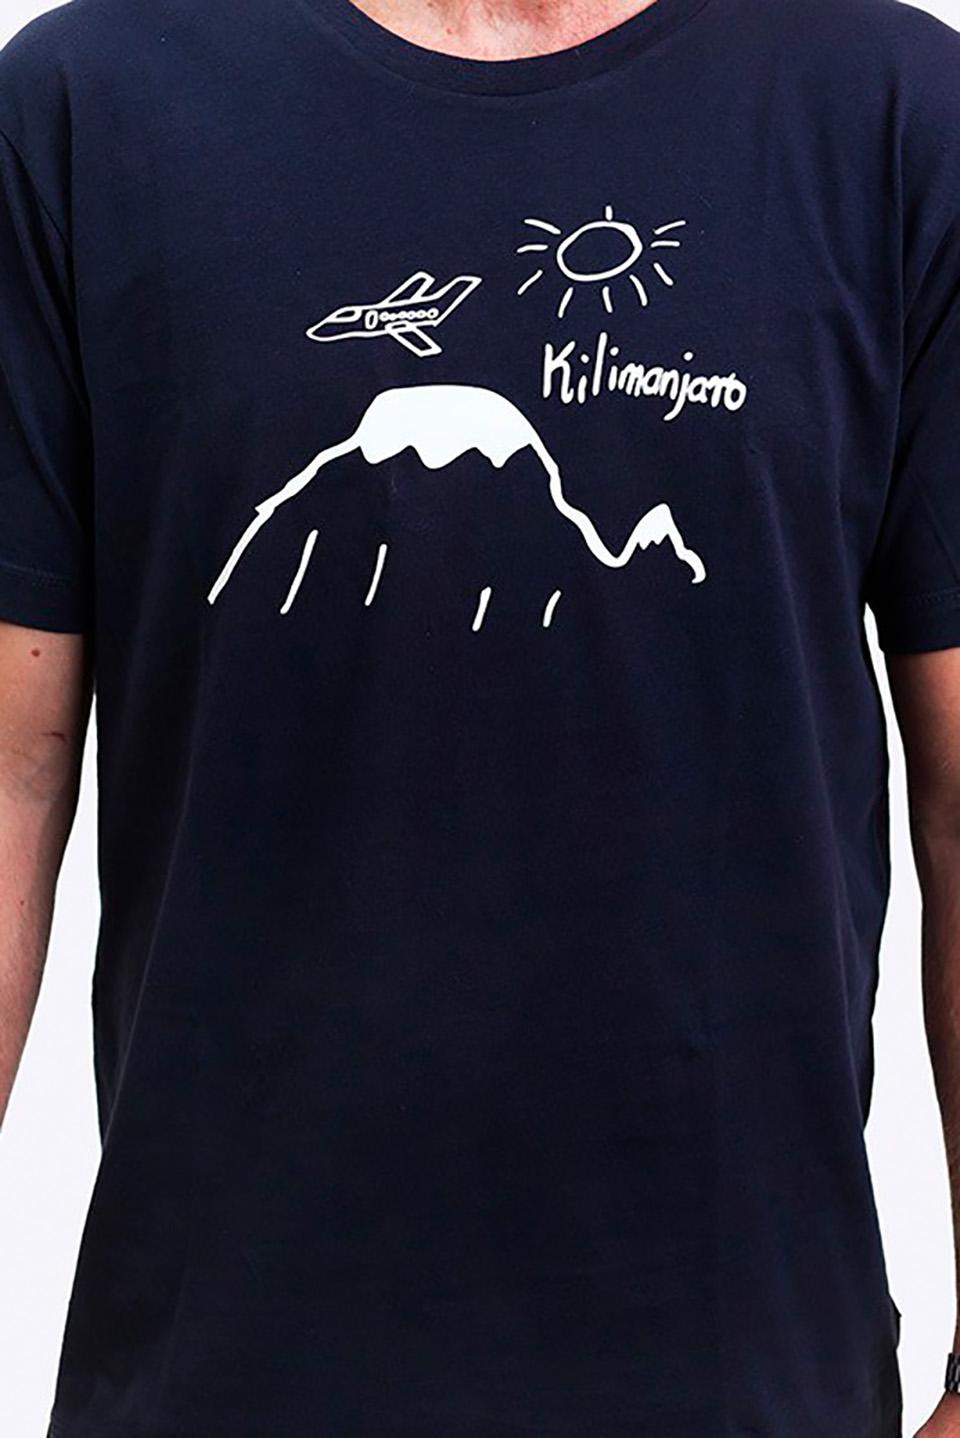 Fair trade Shirt Stuttgart Bio Made in Tanzania Kilimanjaro 2